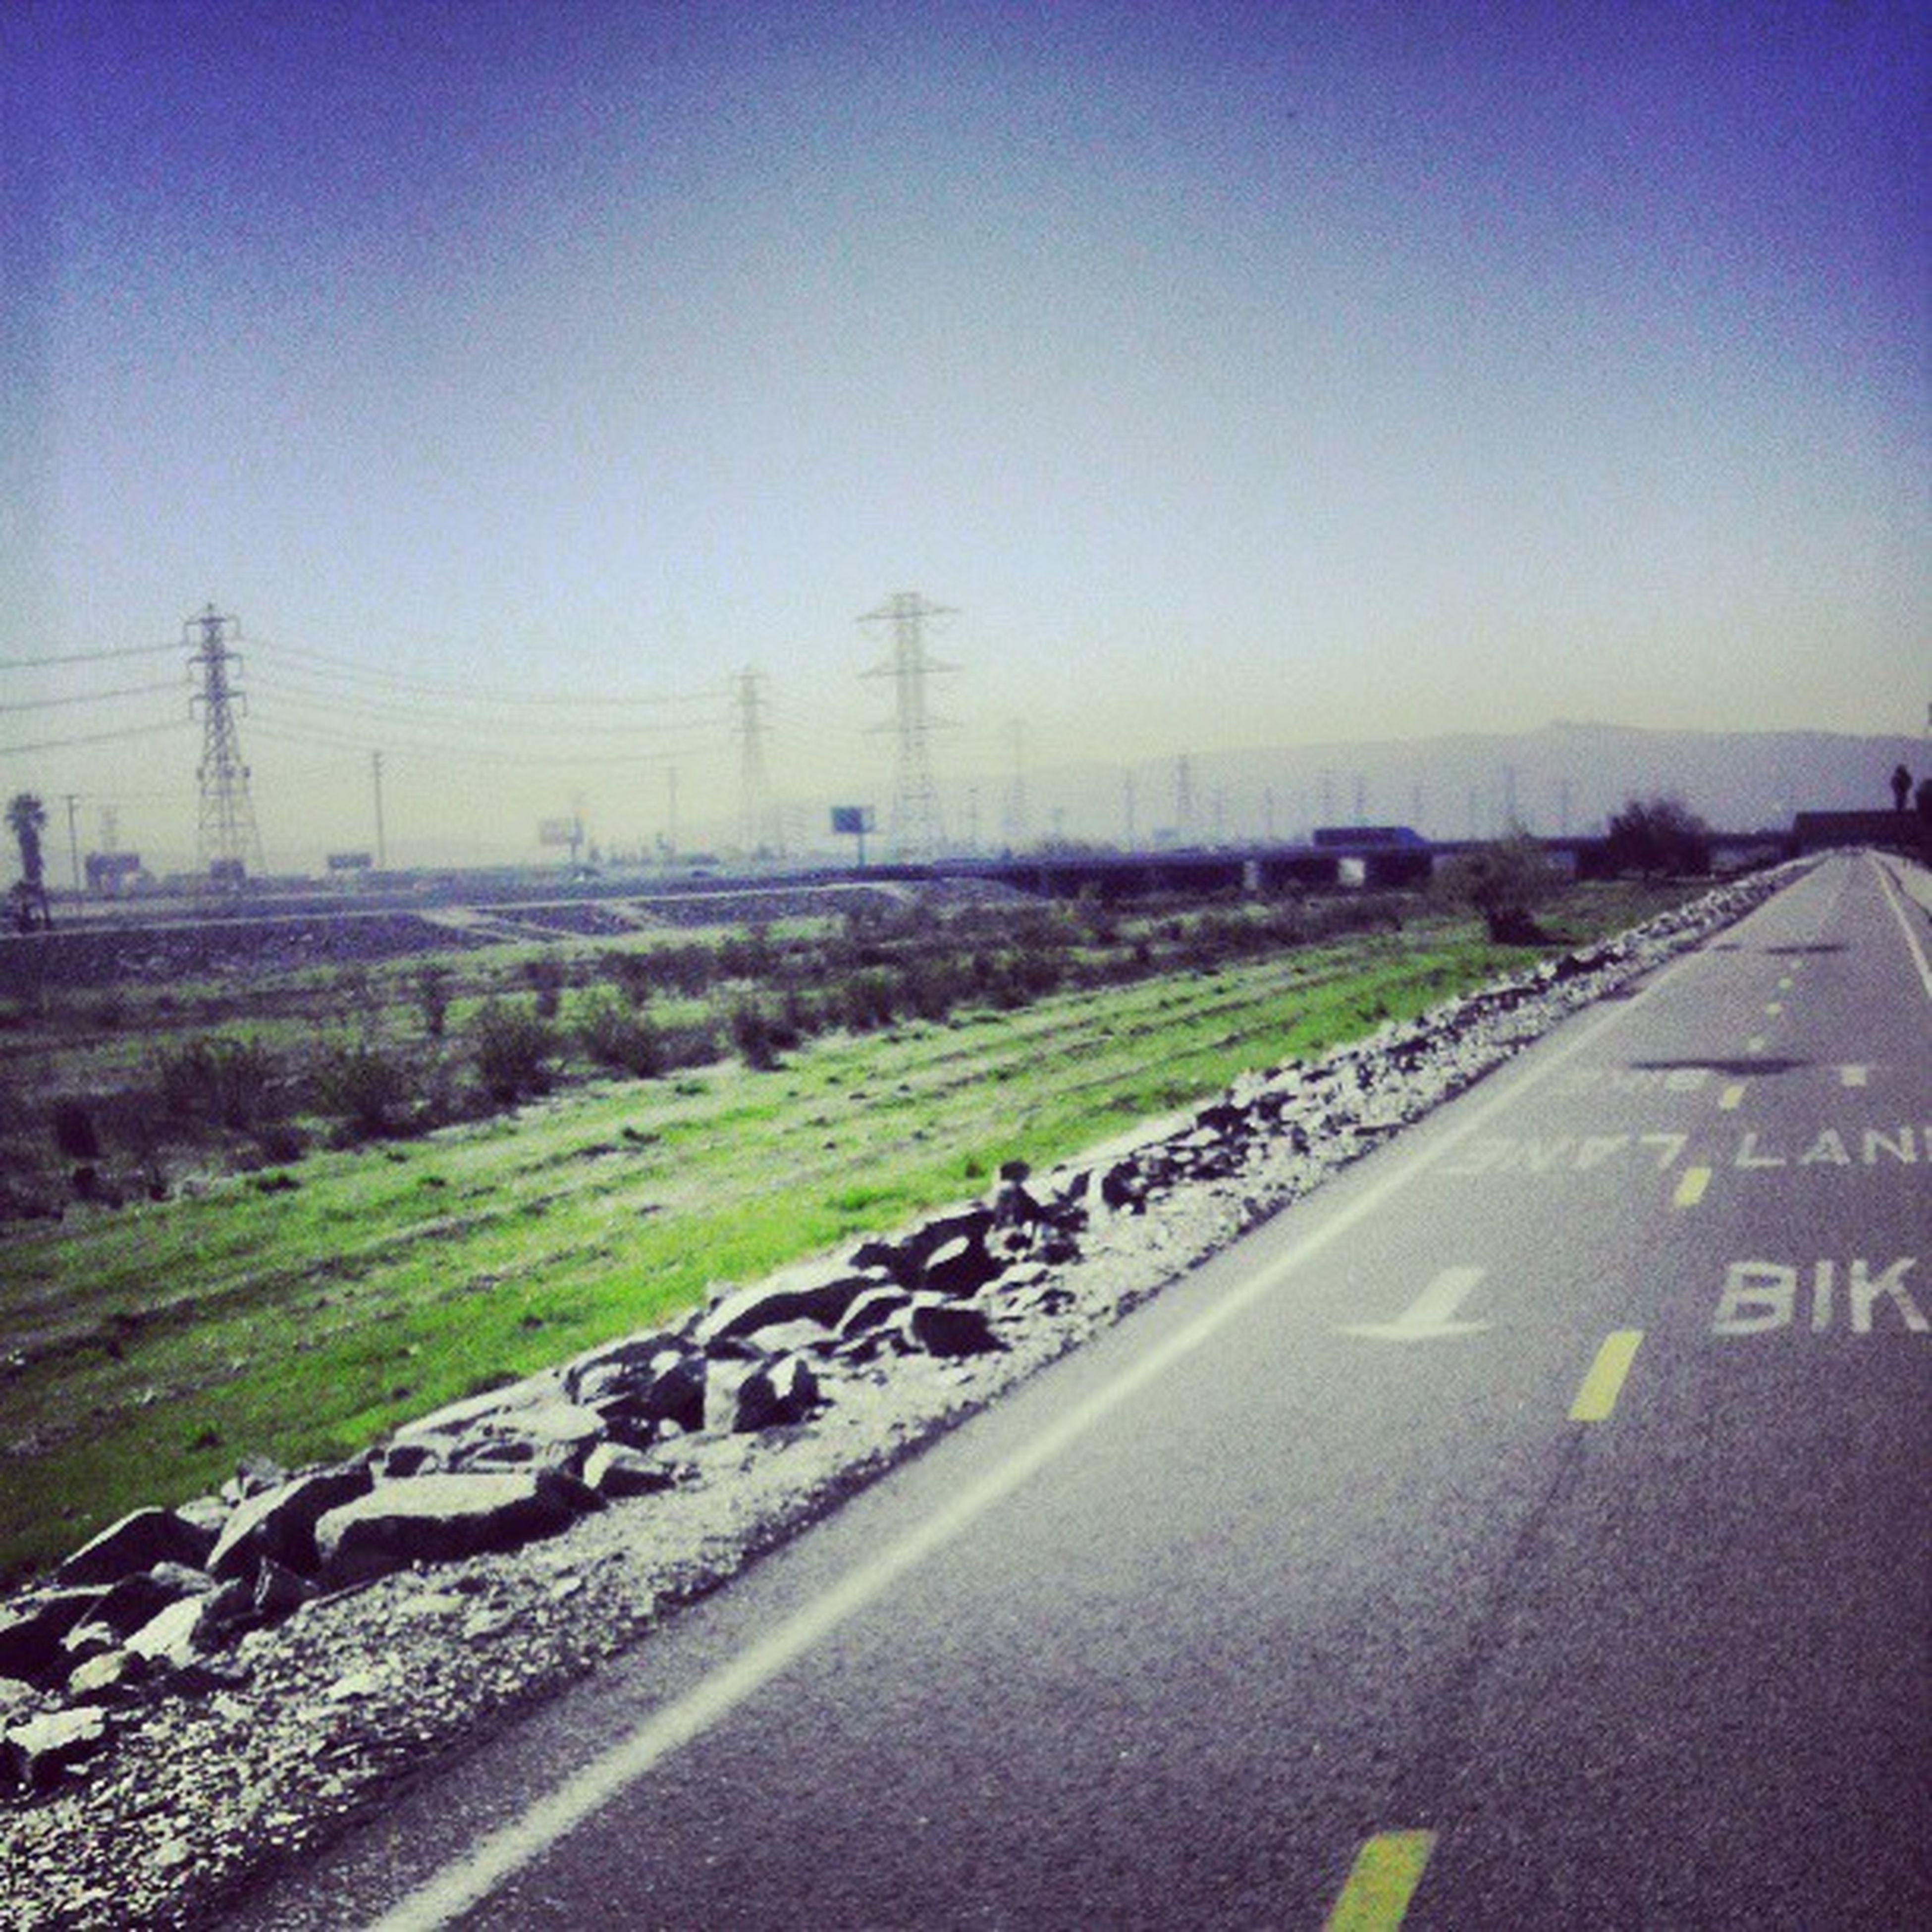 Isn't a good day to be biking it everywhere?? I think yes!! :D BikeTrail Sunnydaysarealwaysgoodtobebikingit GoingToSchool